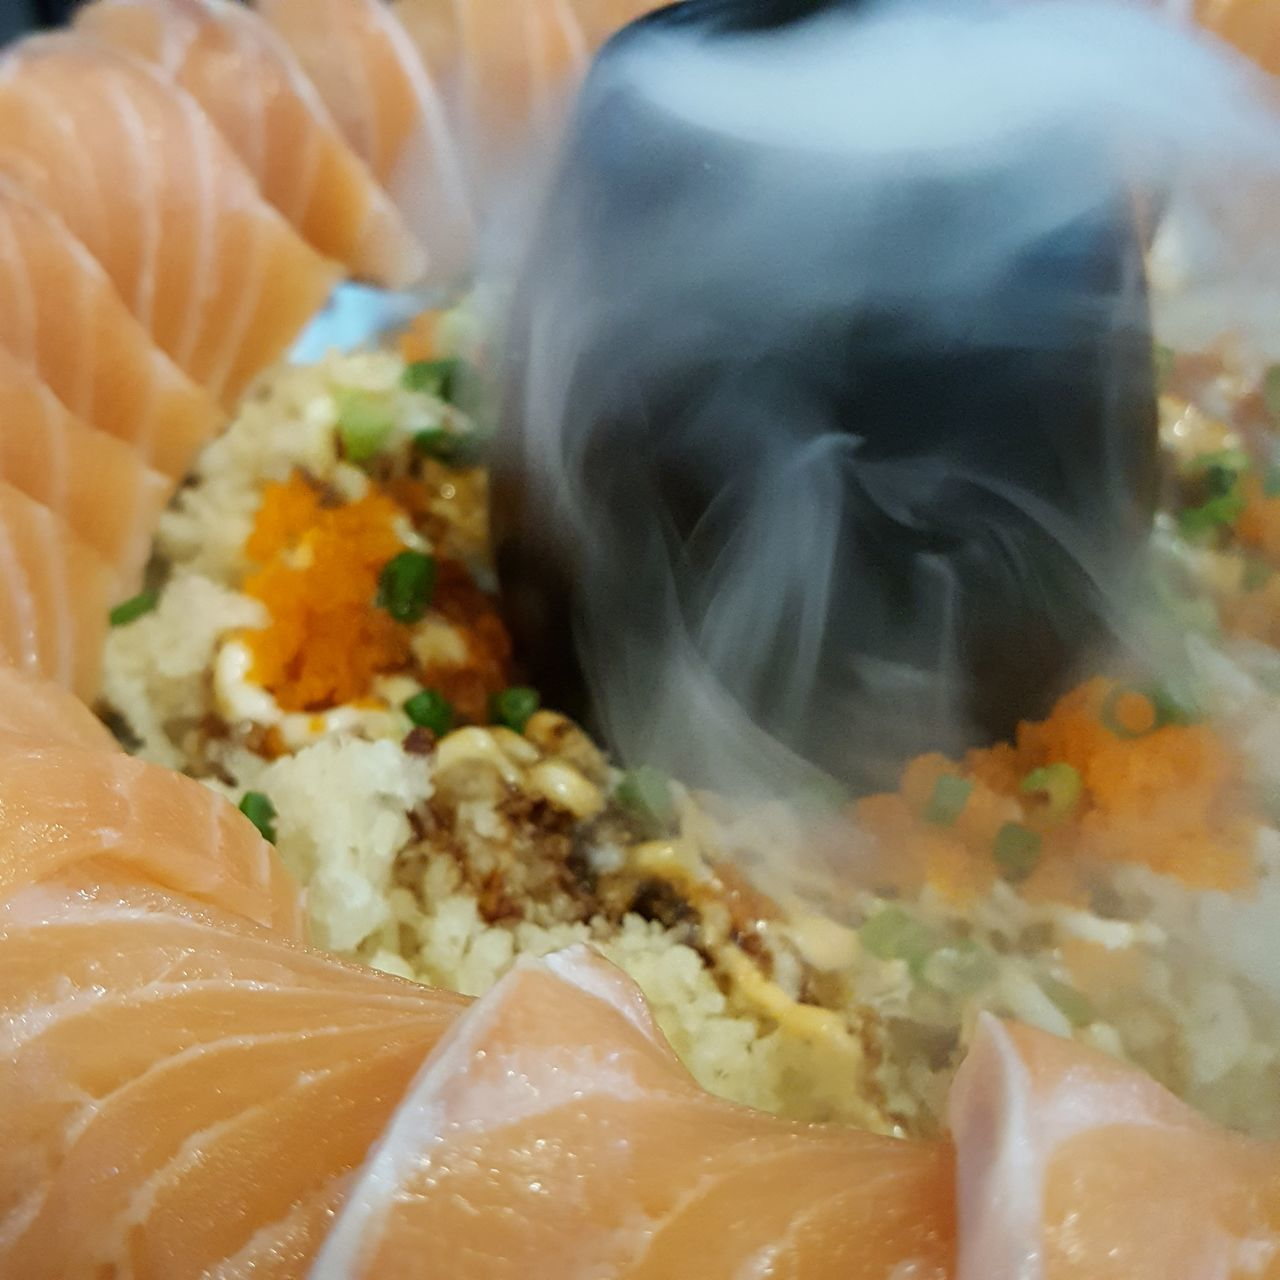 Food SalmonLove Salmon Dish Animals In The Wild Close-up No People Ready-to-eat Salmon Sashimi Salman